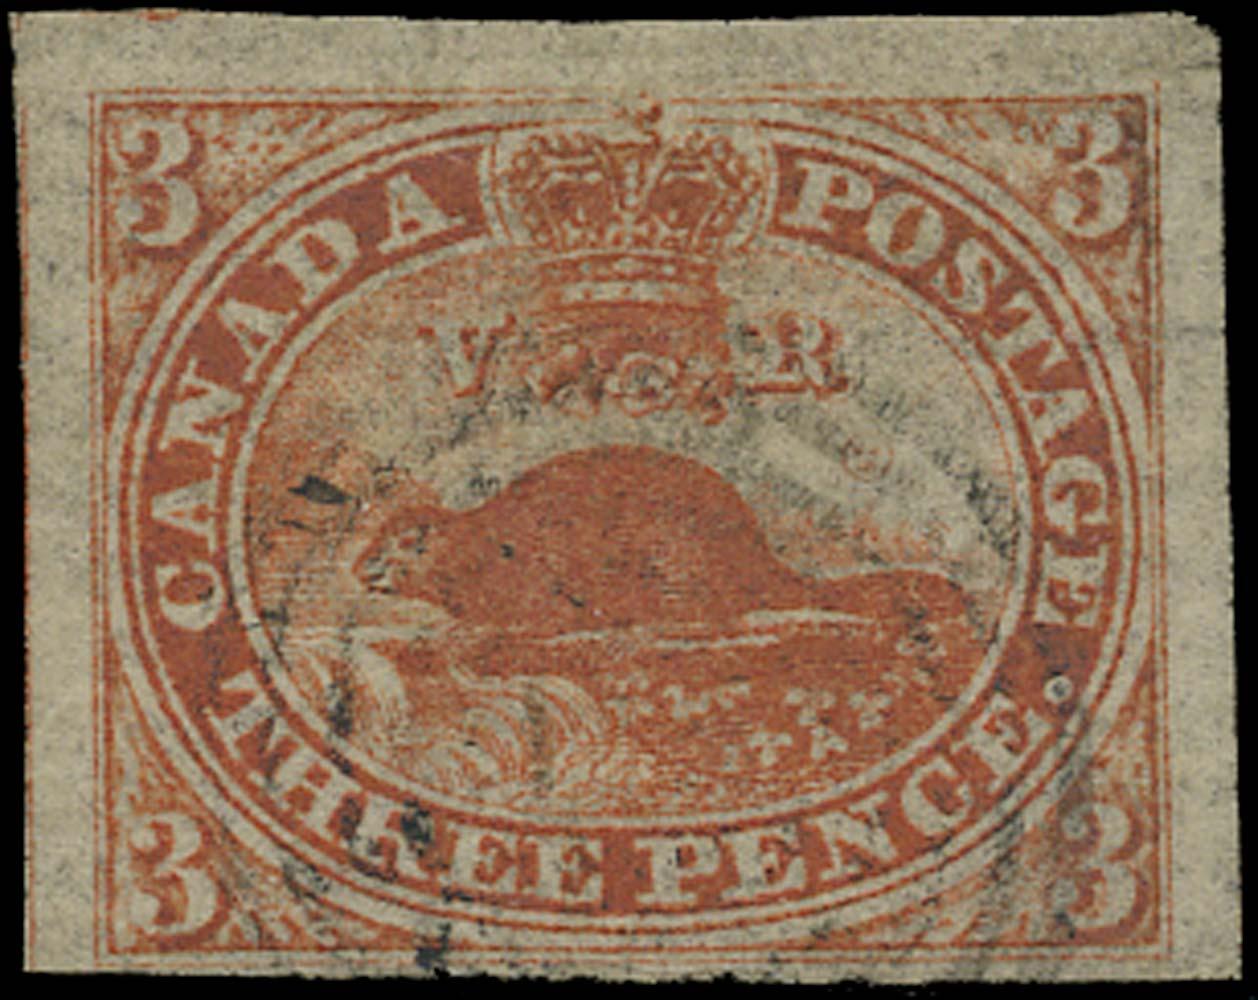 CANADA 1851  SG1a Used 3d orange-vermilion Beaver on Laid paper